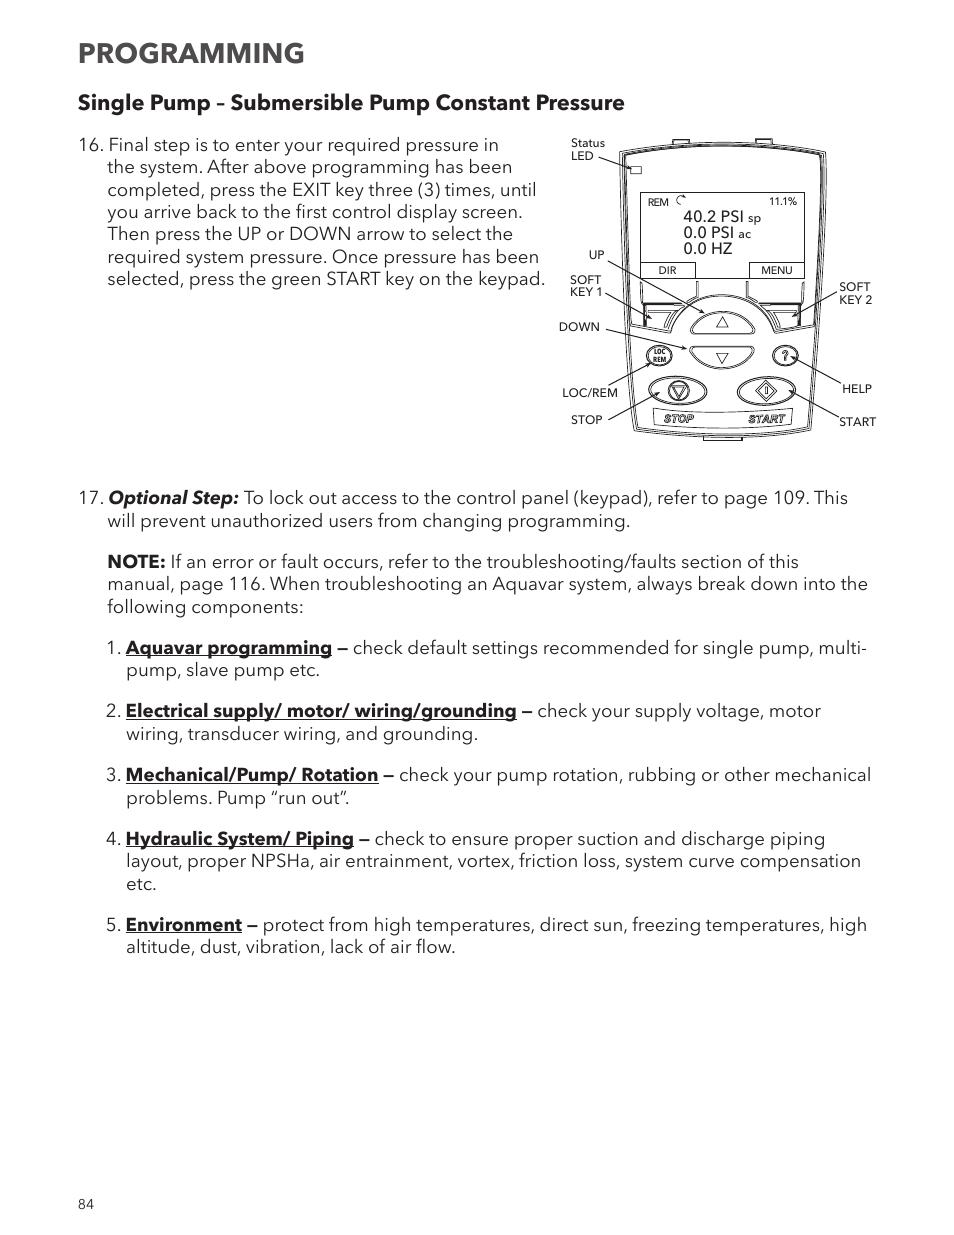 medium resolution of programming single pump submersible pump constant pressure xylem im167 r8 aquavar cpc centrifugal pump control user manual page 84 152